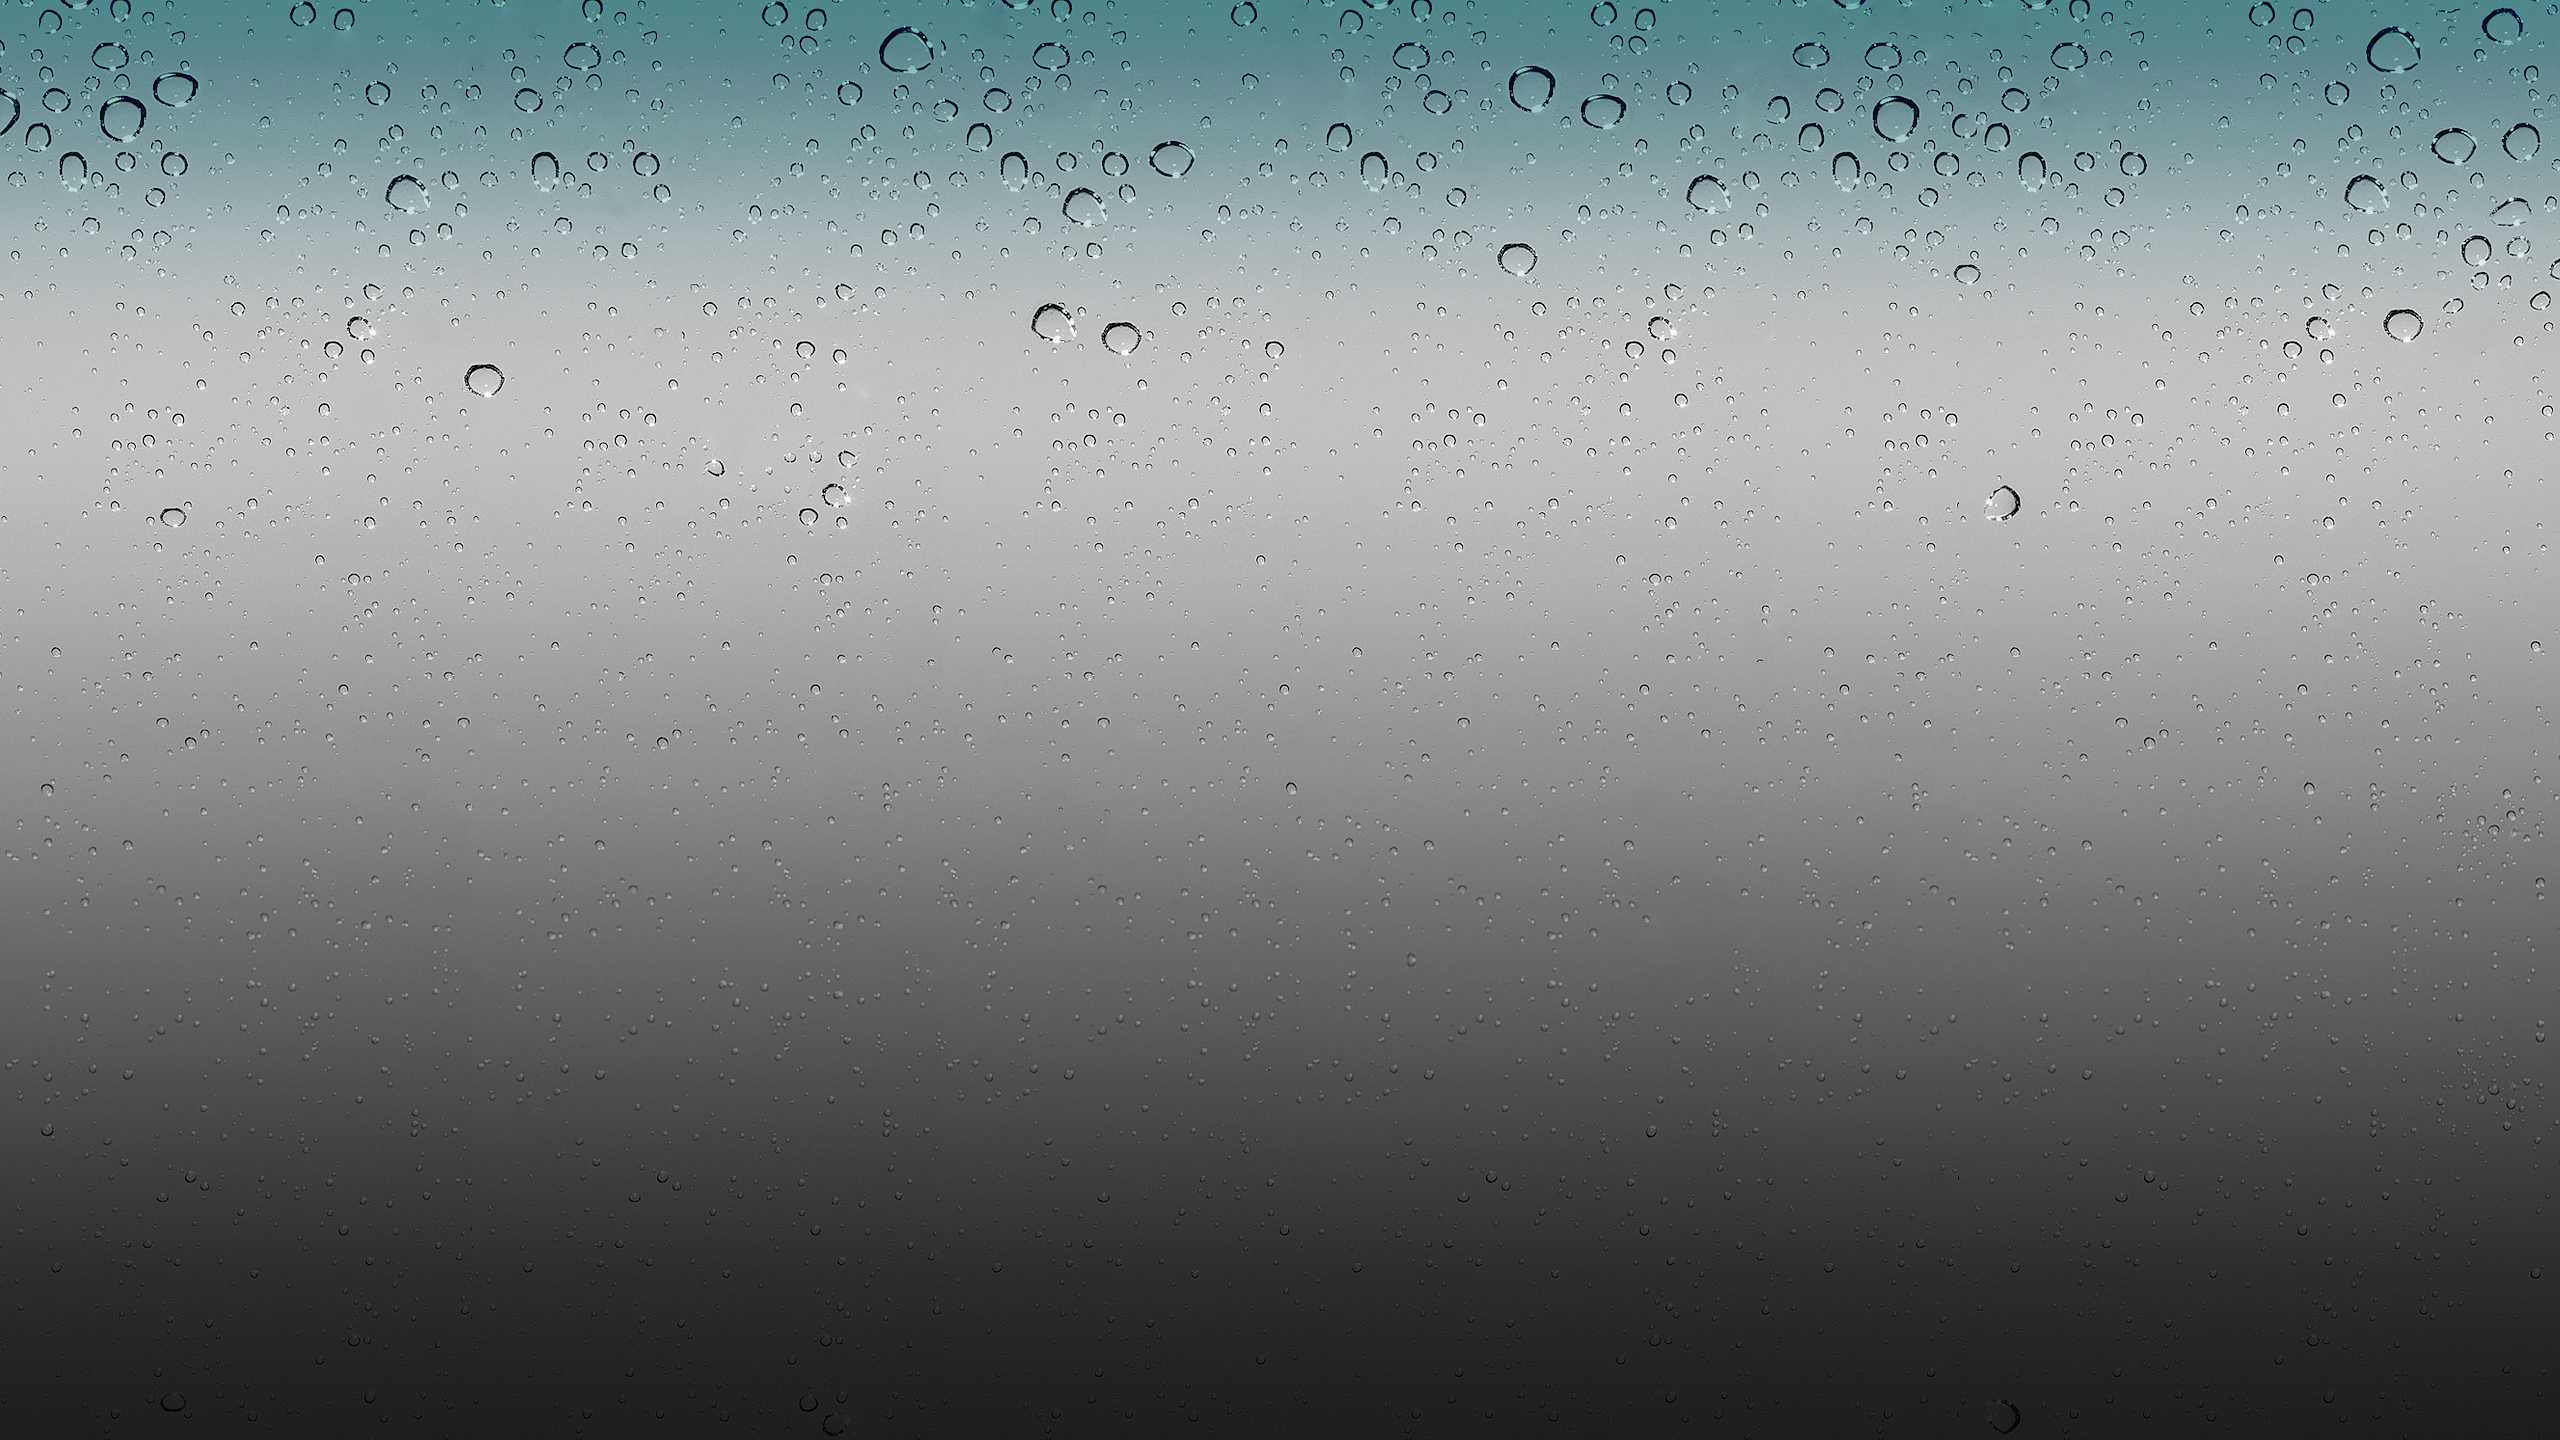 ios rain drops wallpaper hd by airplane by 0burn0 on